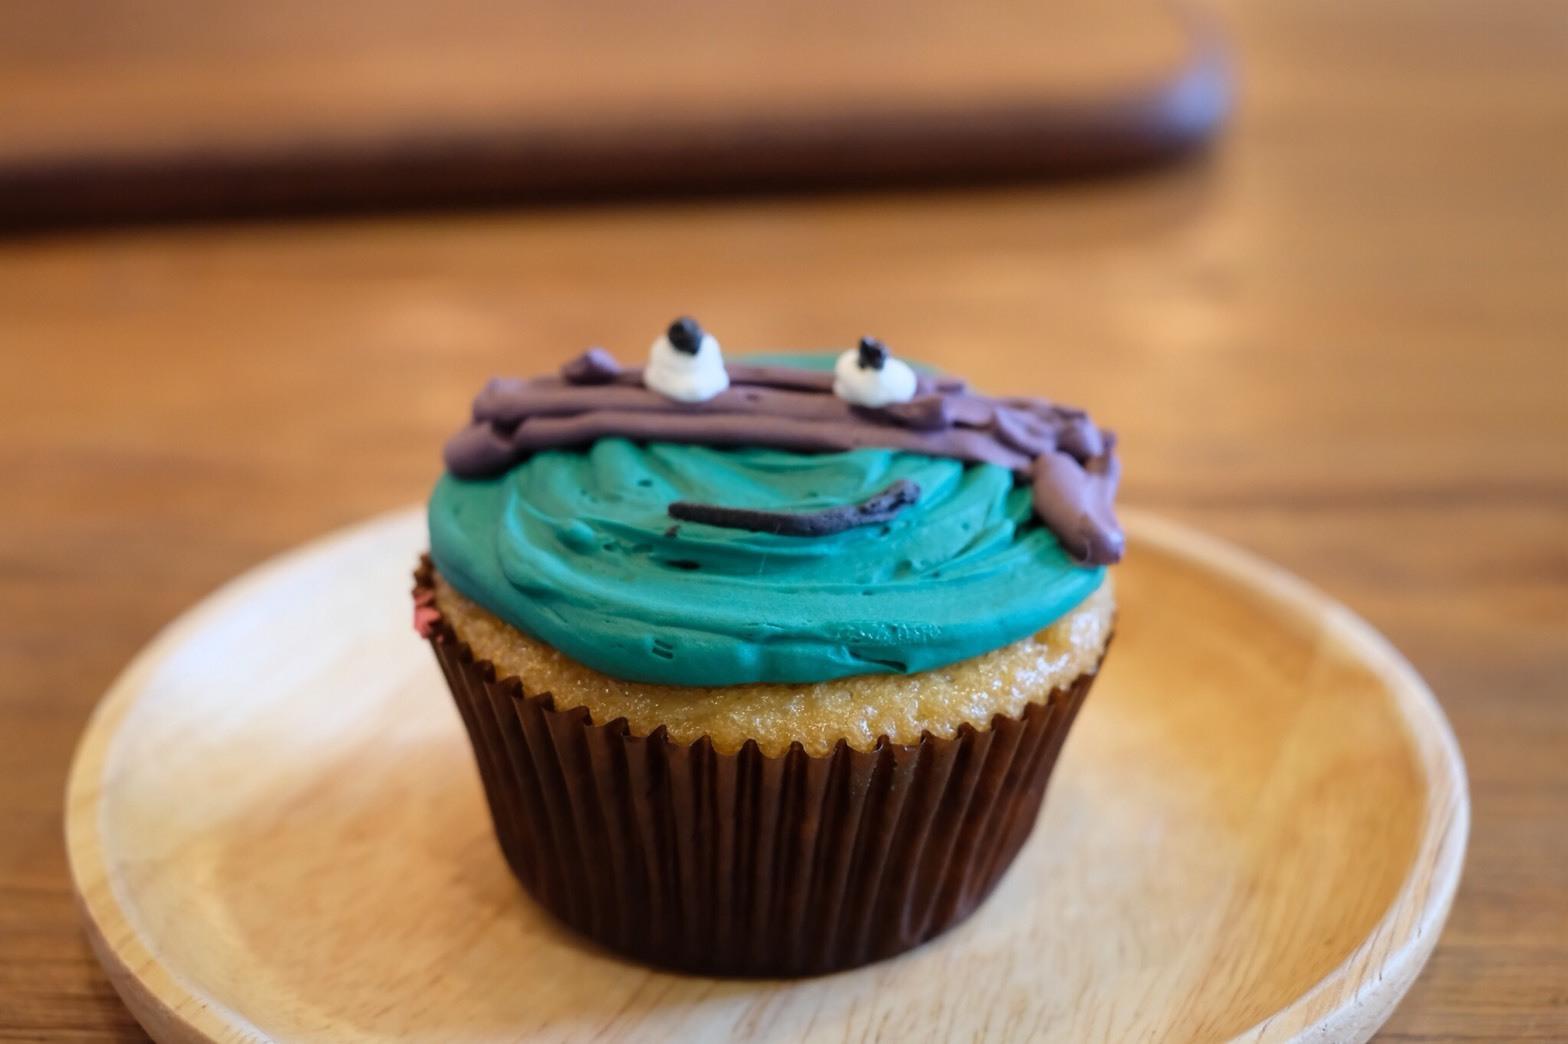 Kids Cupcakes (24 pieces) 00010